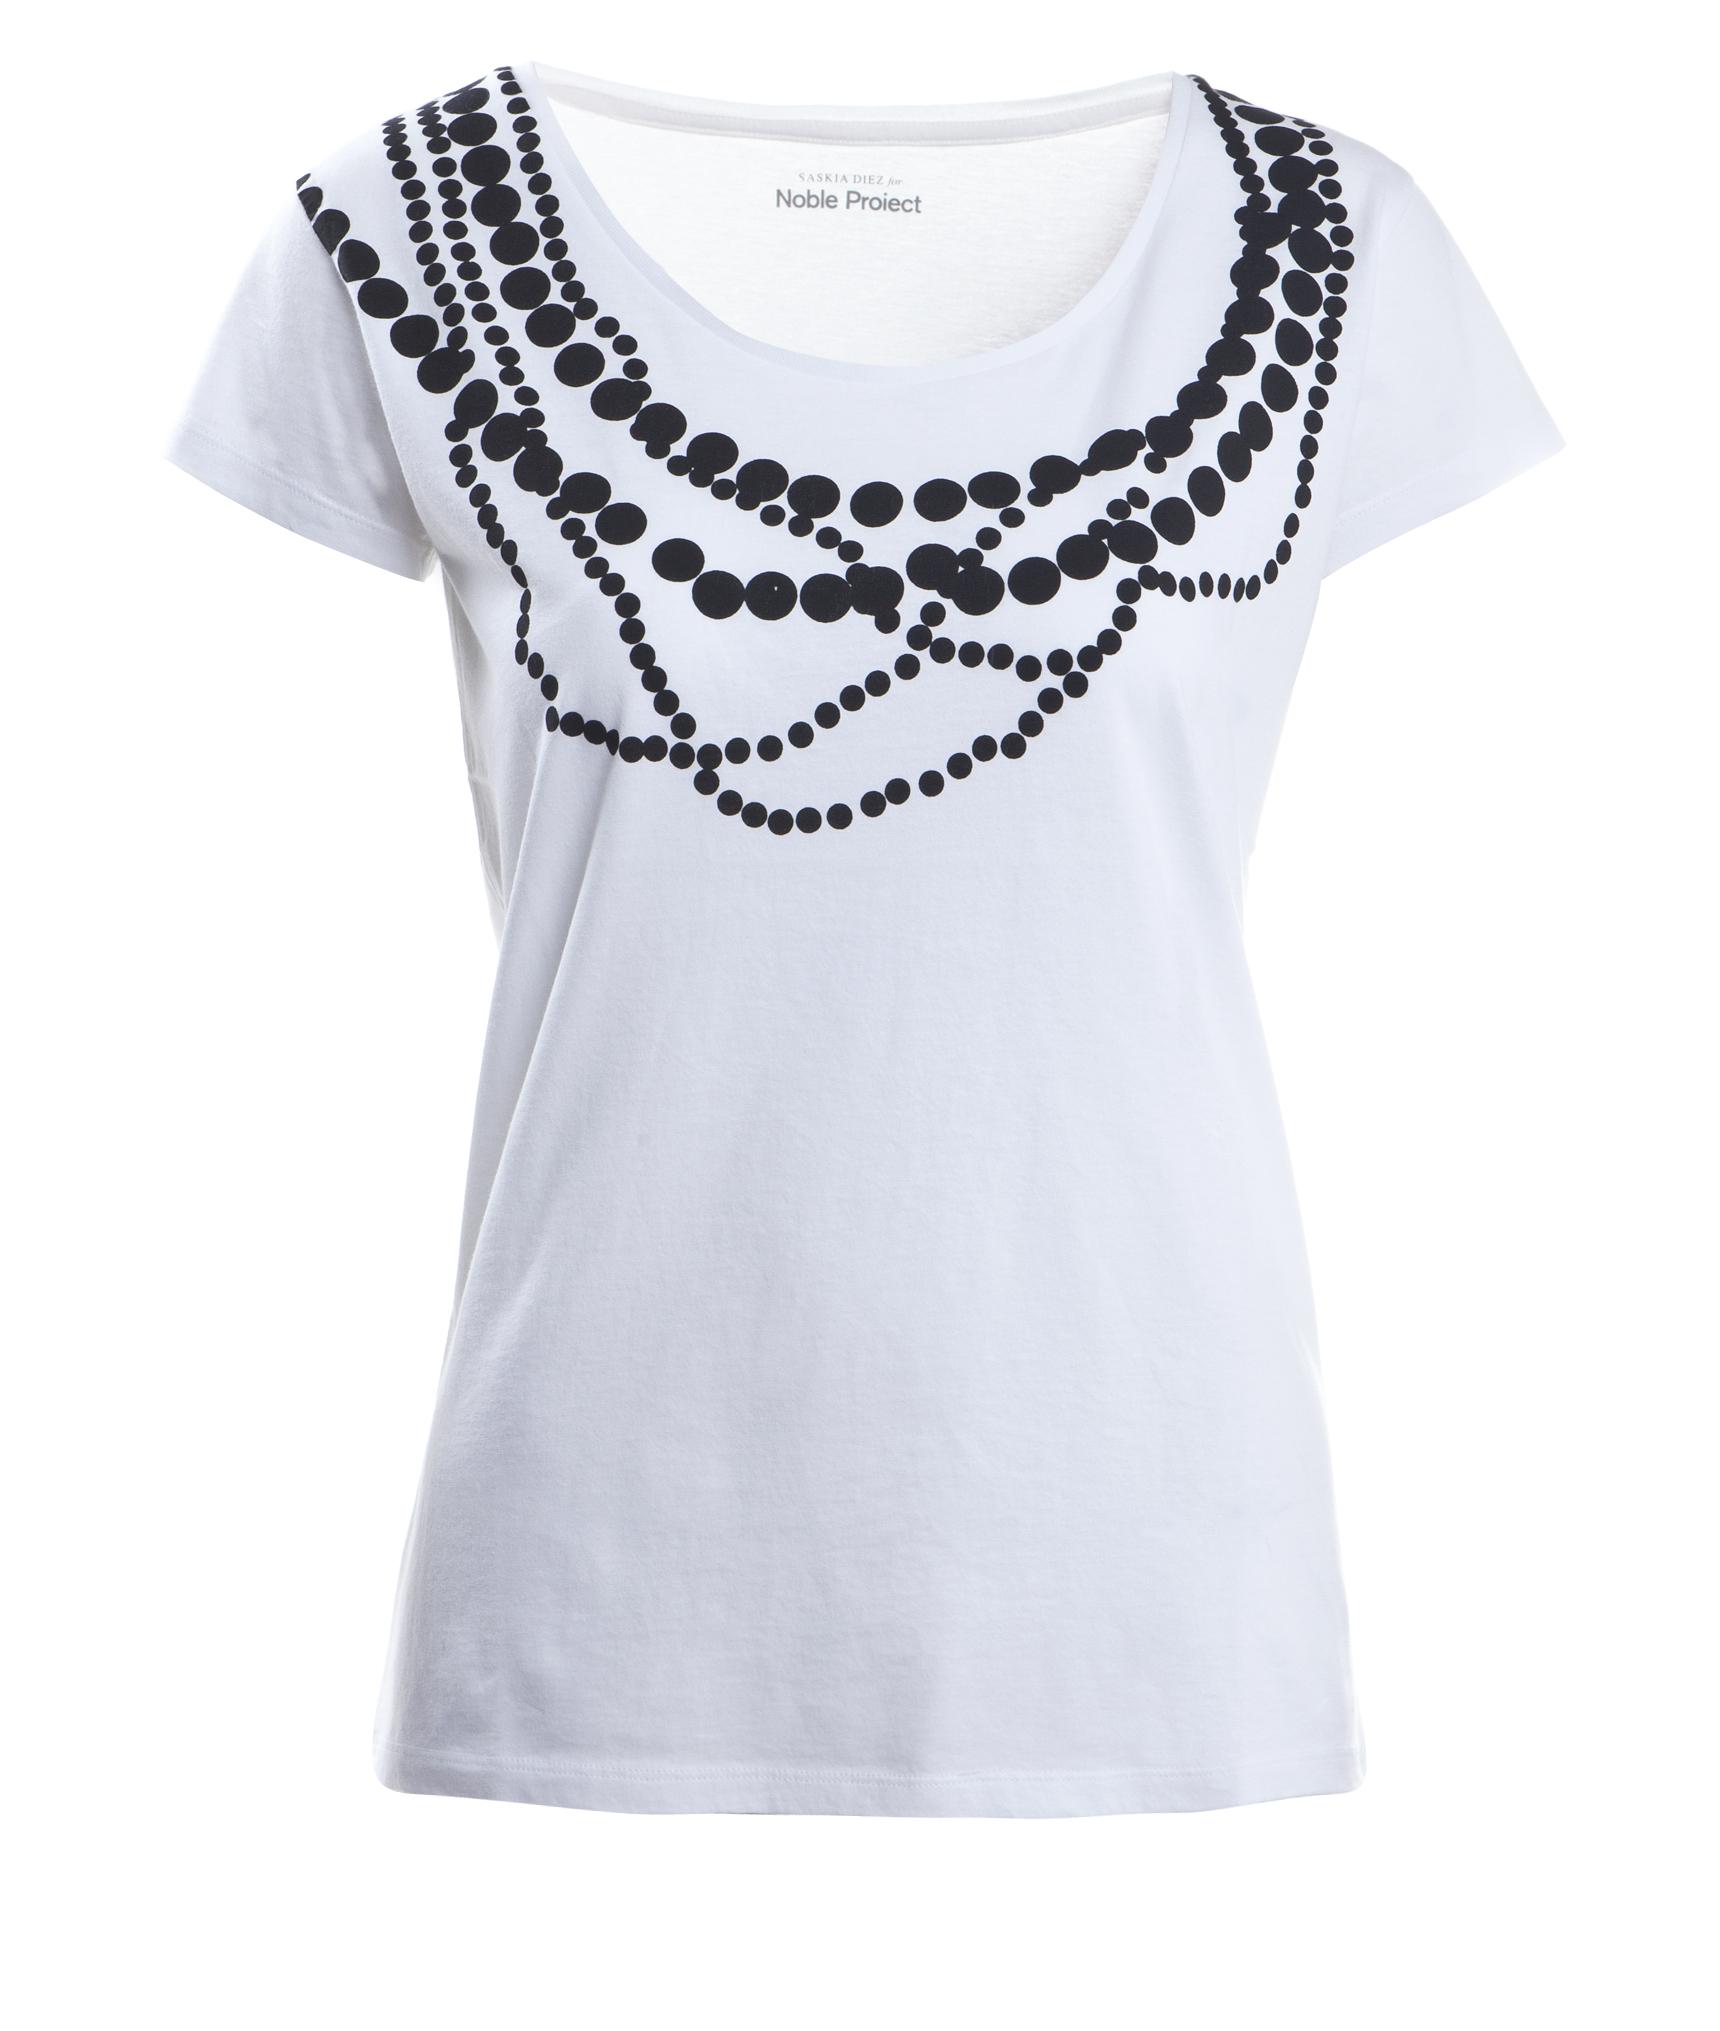 Nobel Project Saskia Shirt glore